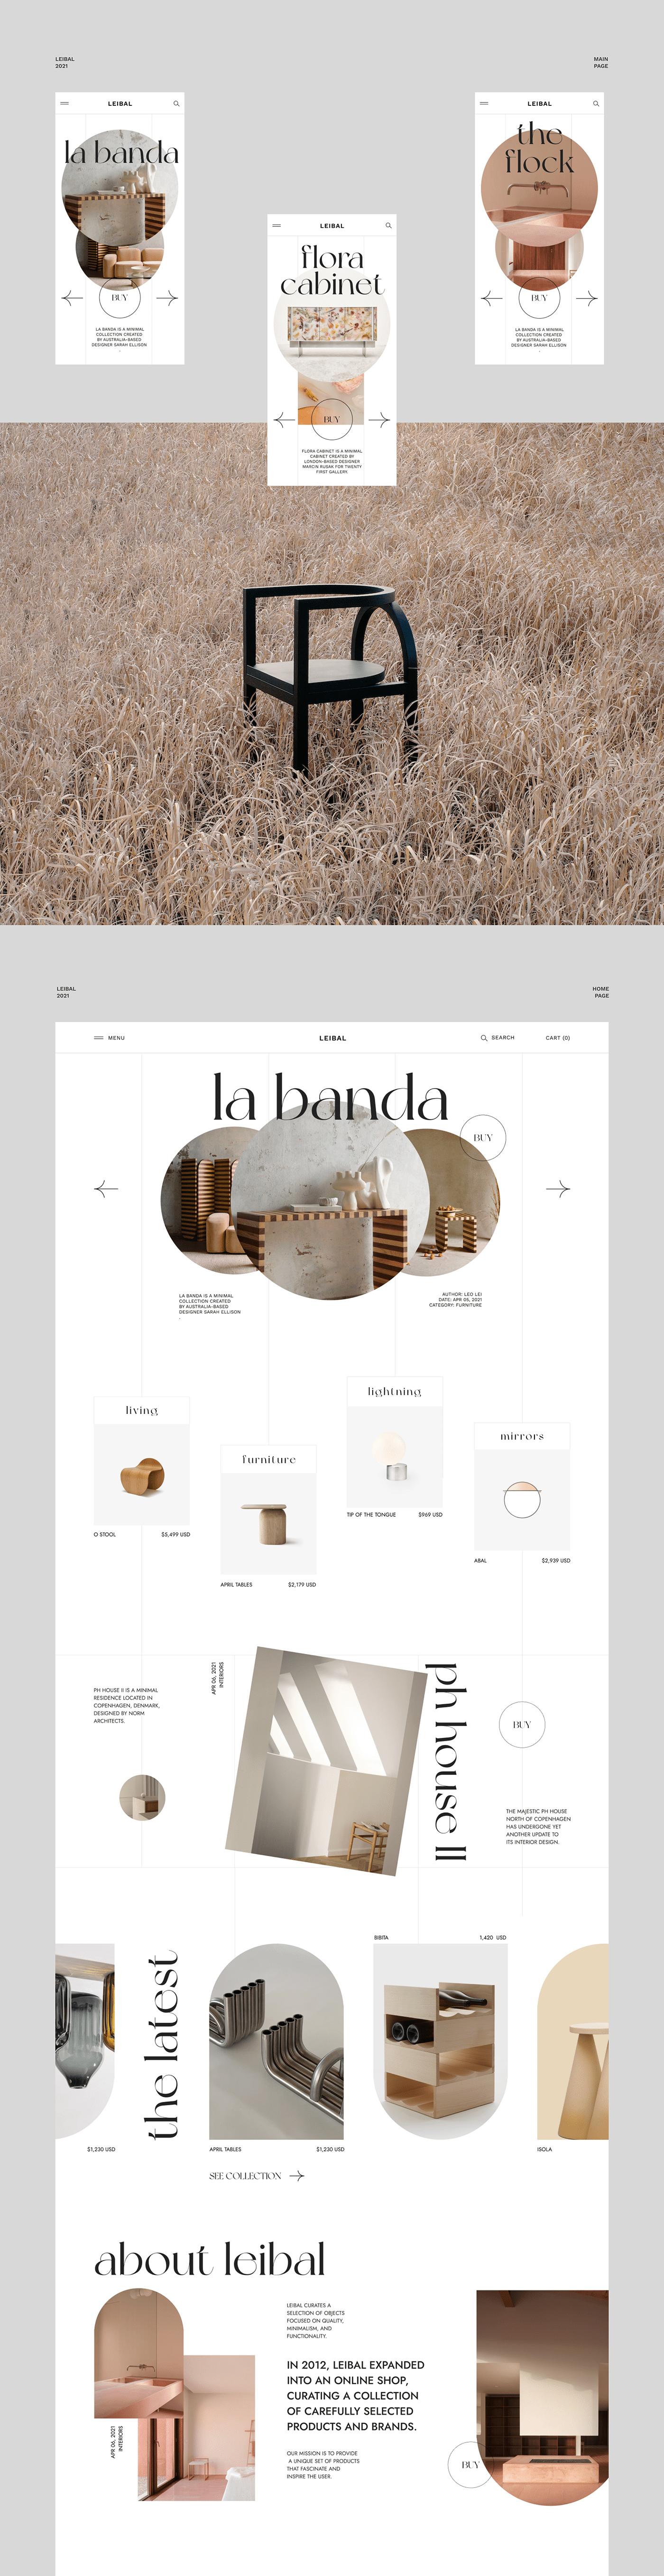 @webdesign #architecture #e-commerce #furniture  #minimalistic #uiux